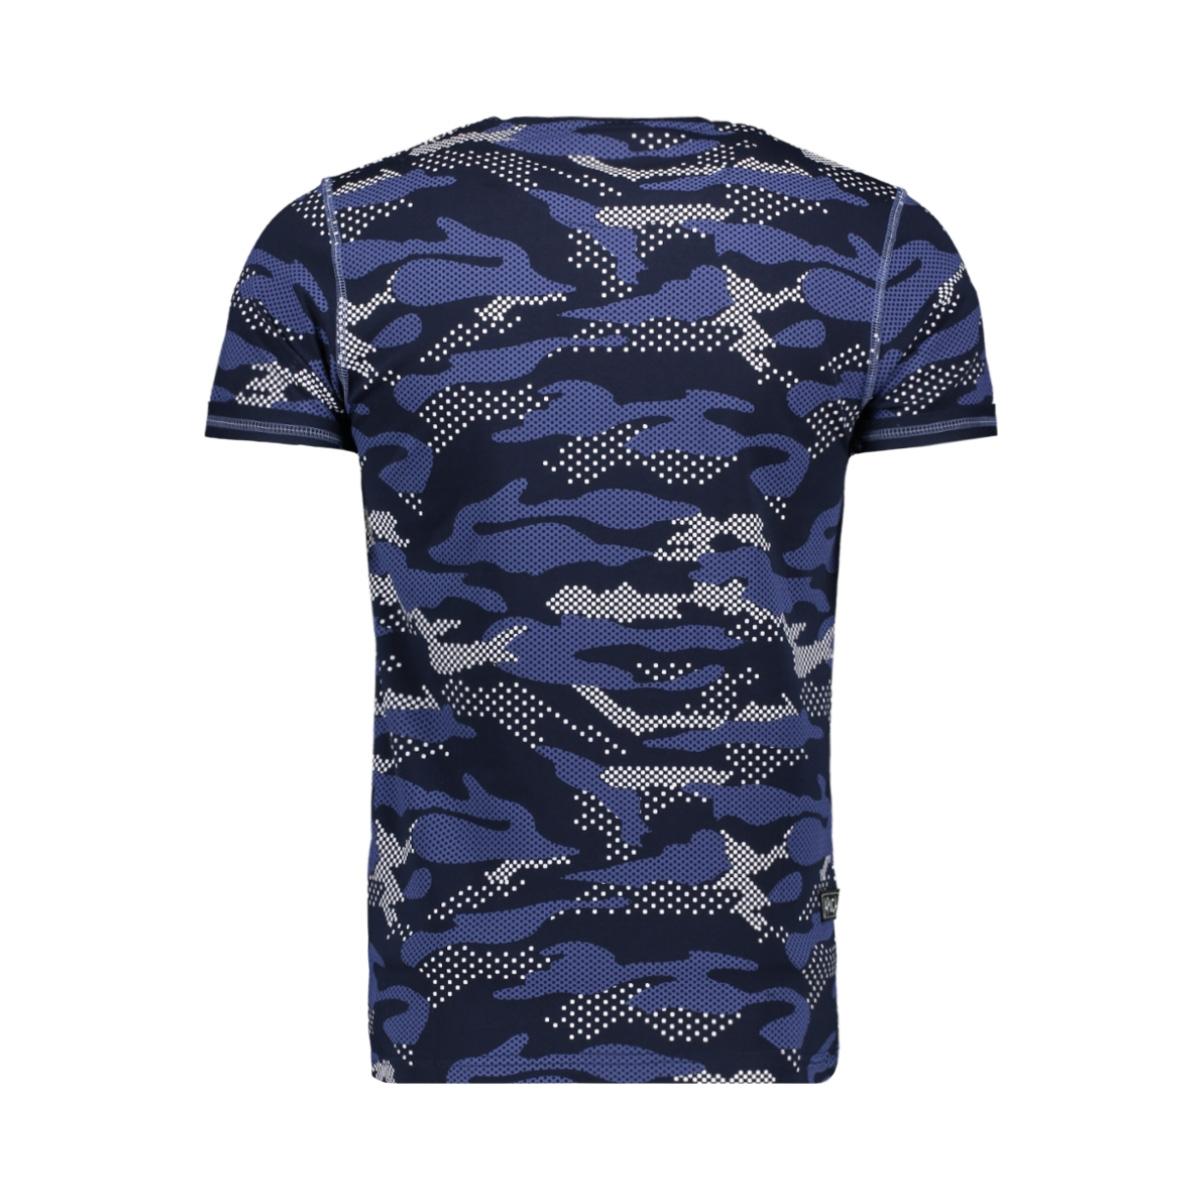 t shirt 13821 gabbiano t-shirt navy